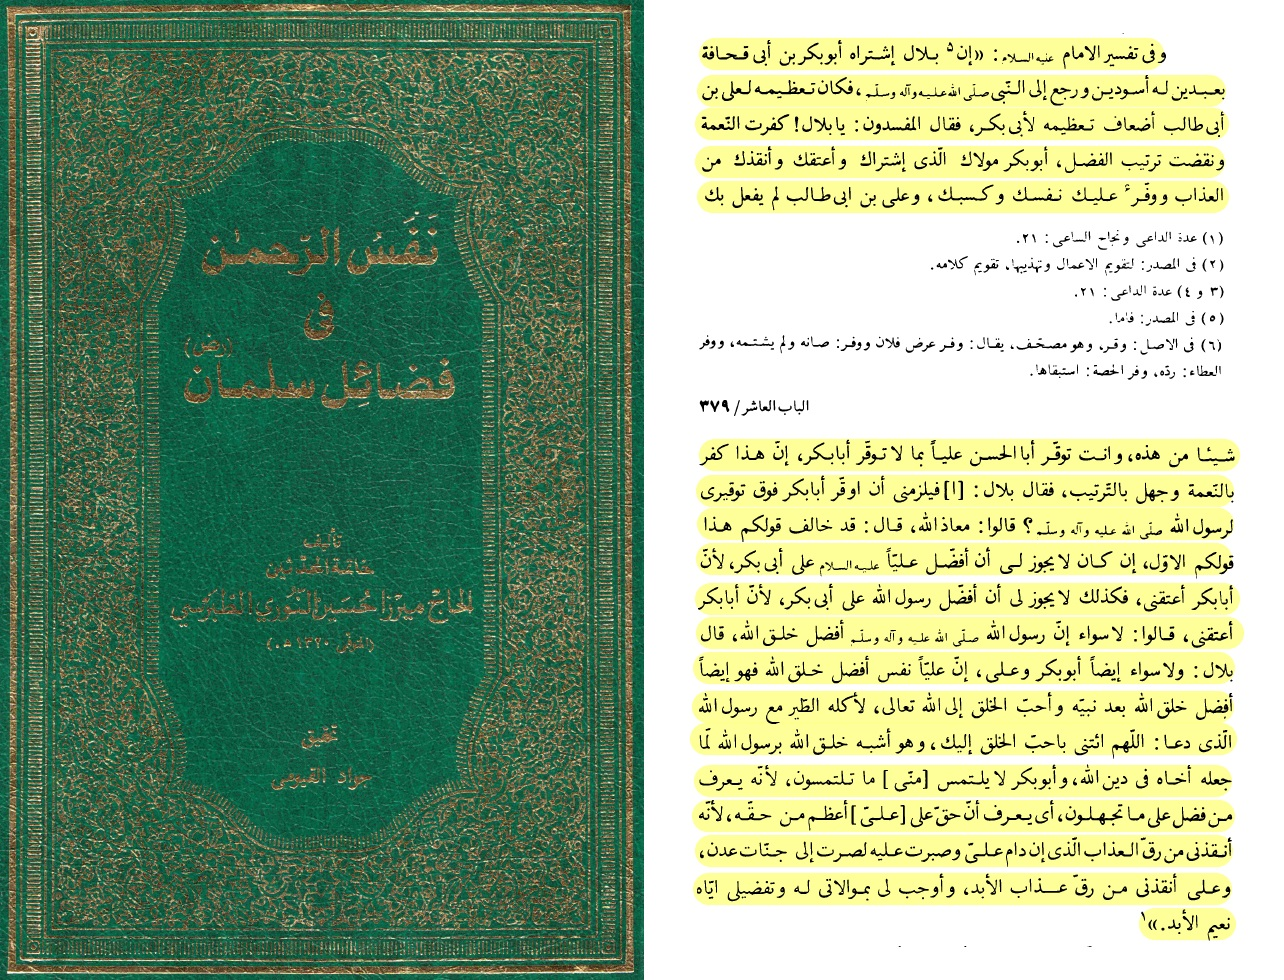 nafs-e-ra7man-s-378-379